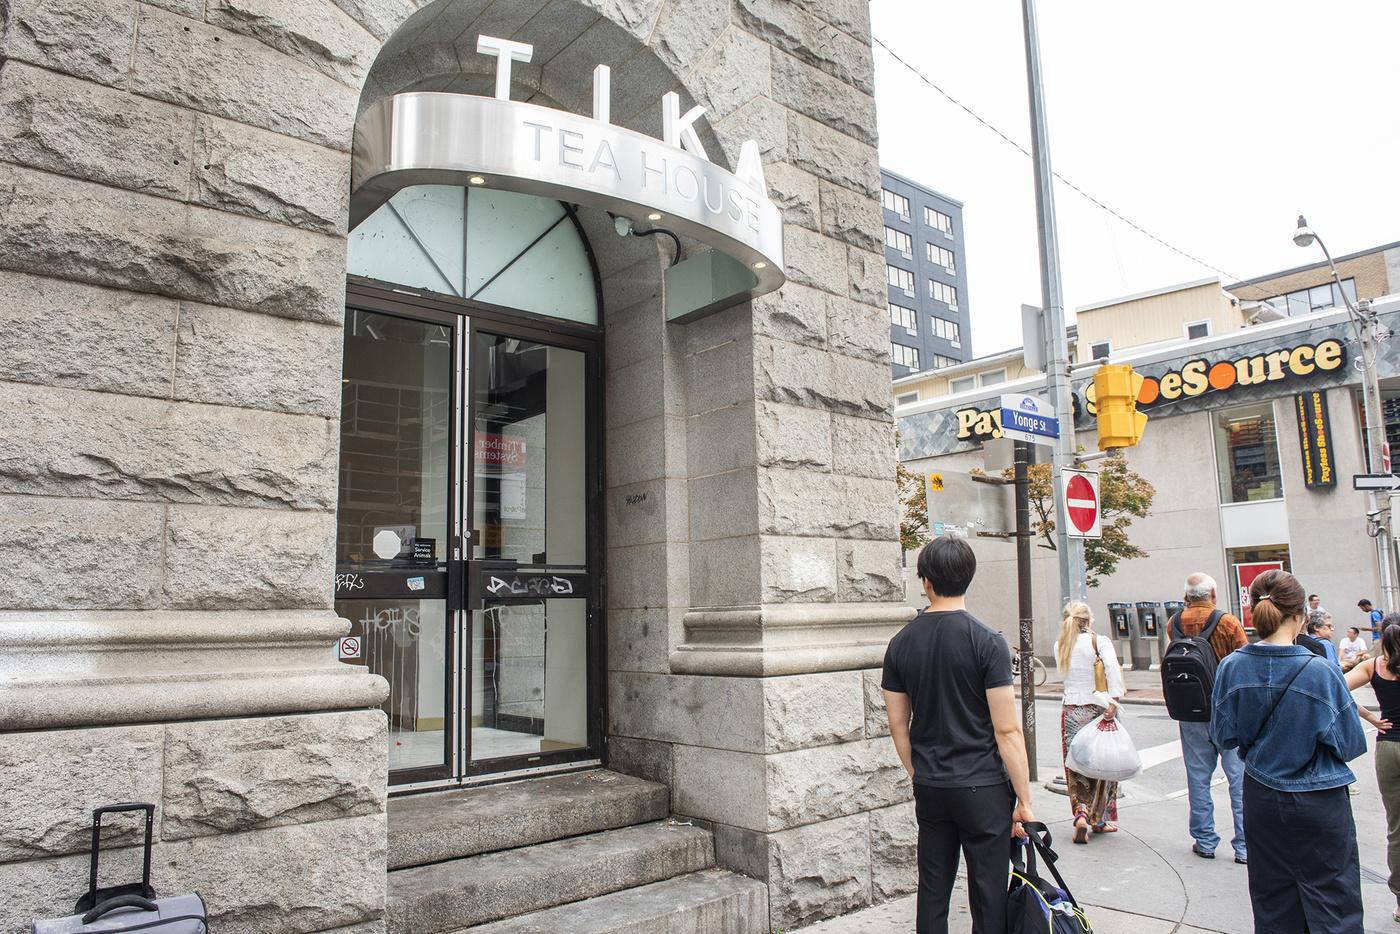 Tika Toronto